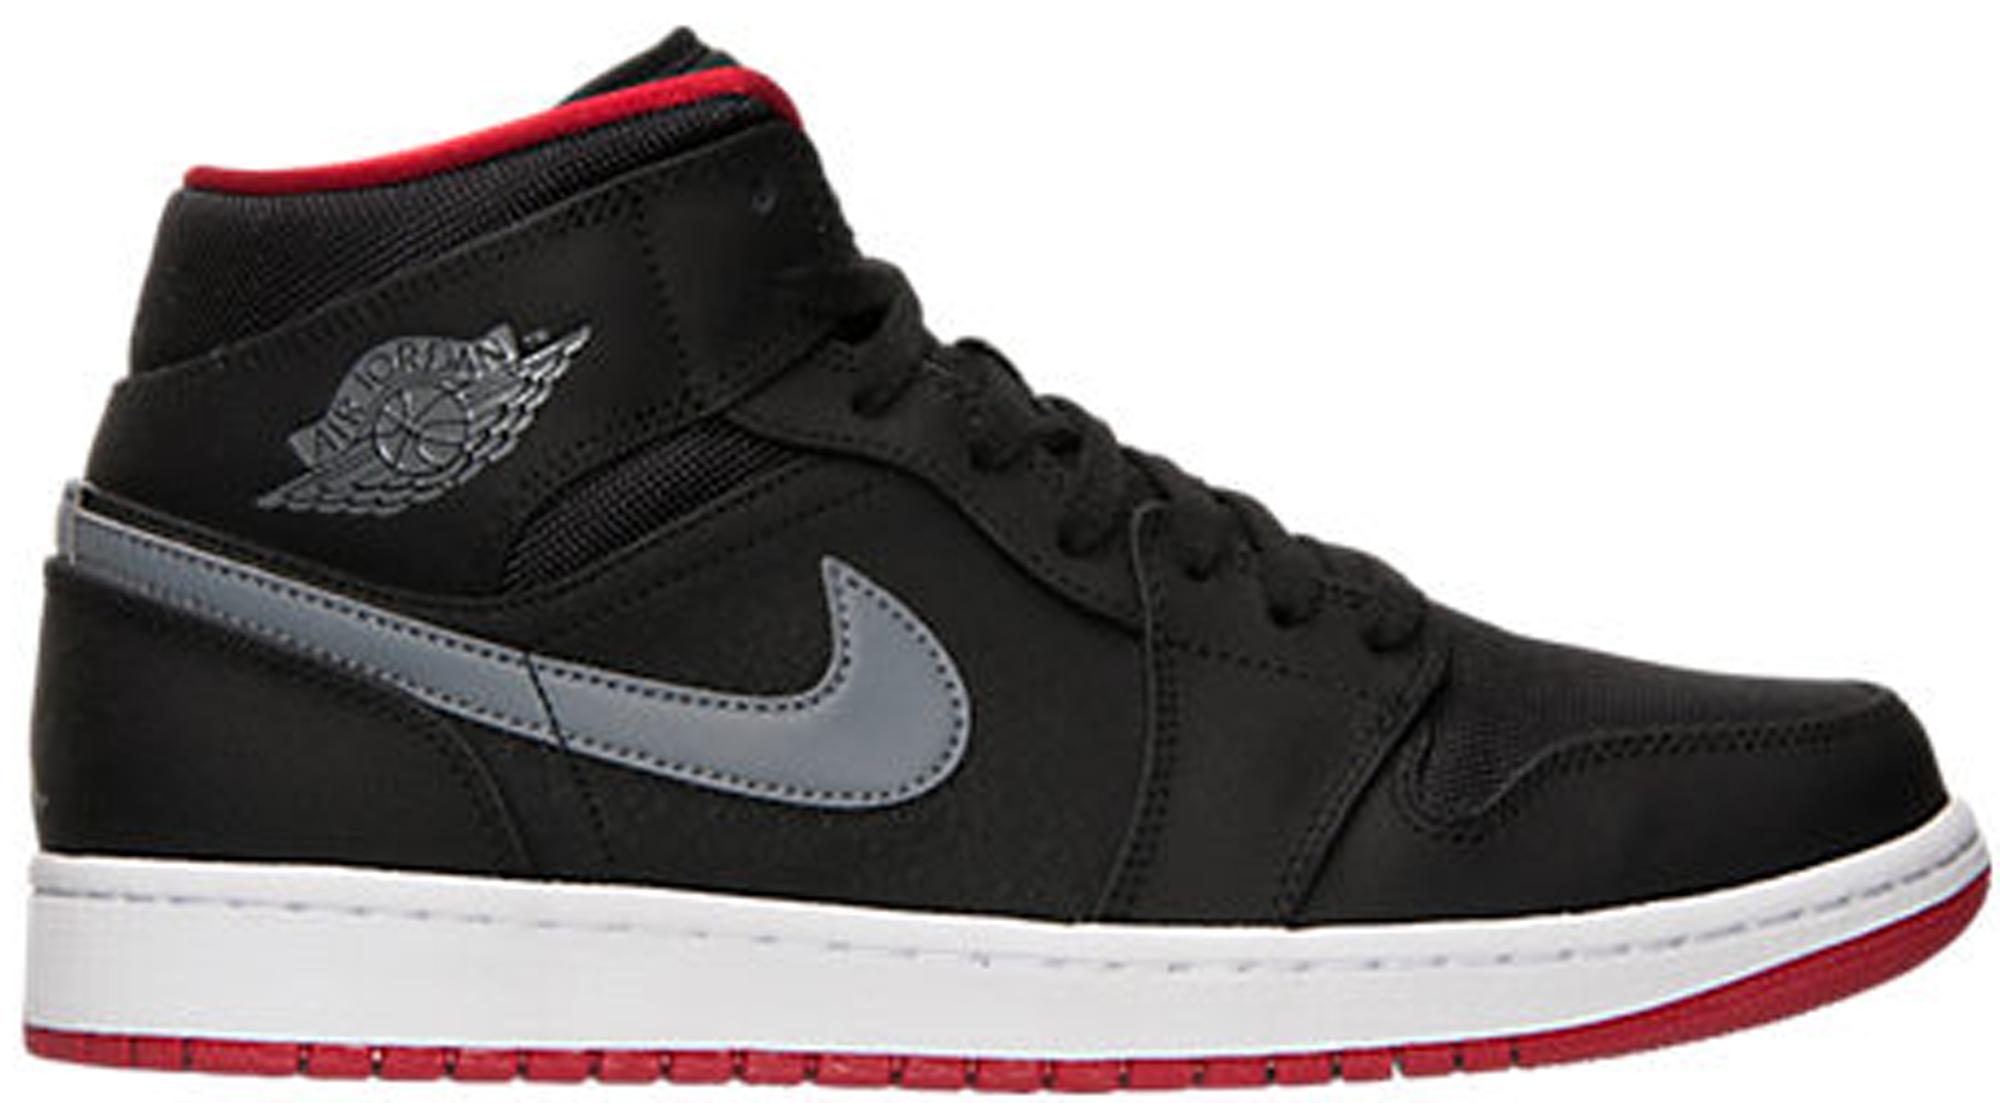 Jordan 1 Mid Black Cool Grey Gym Red